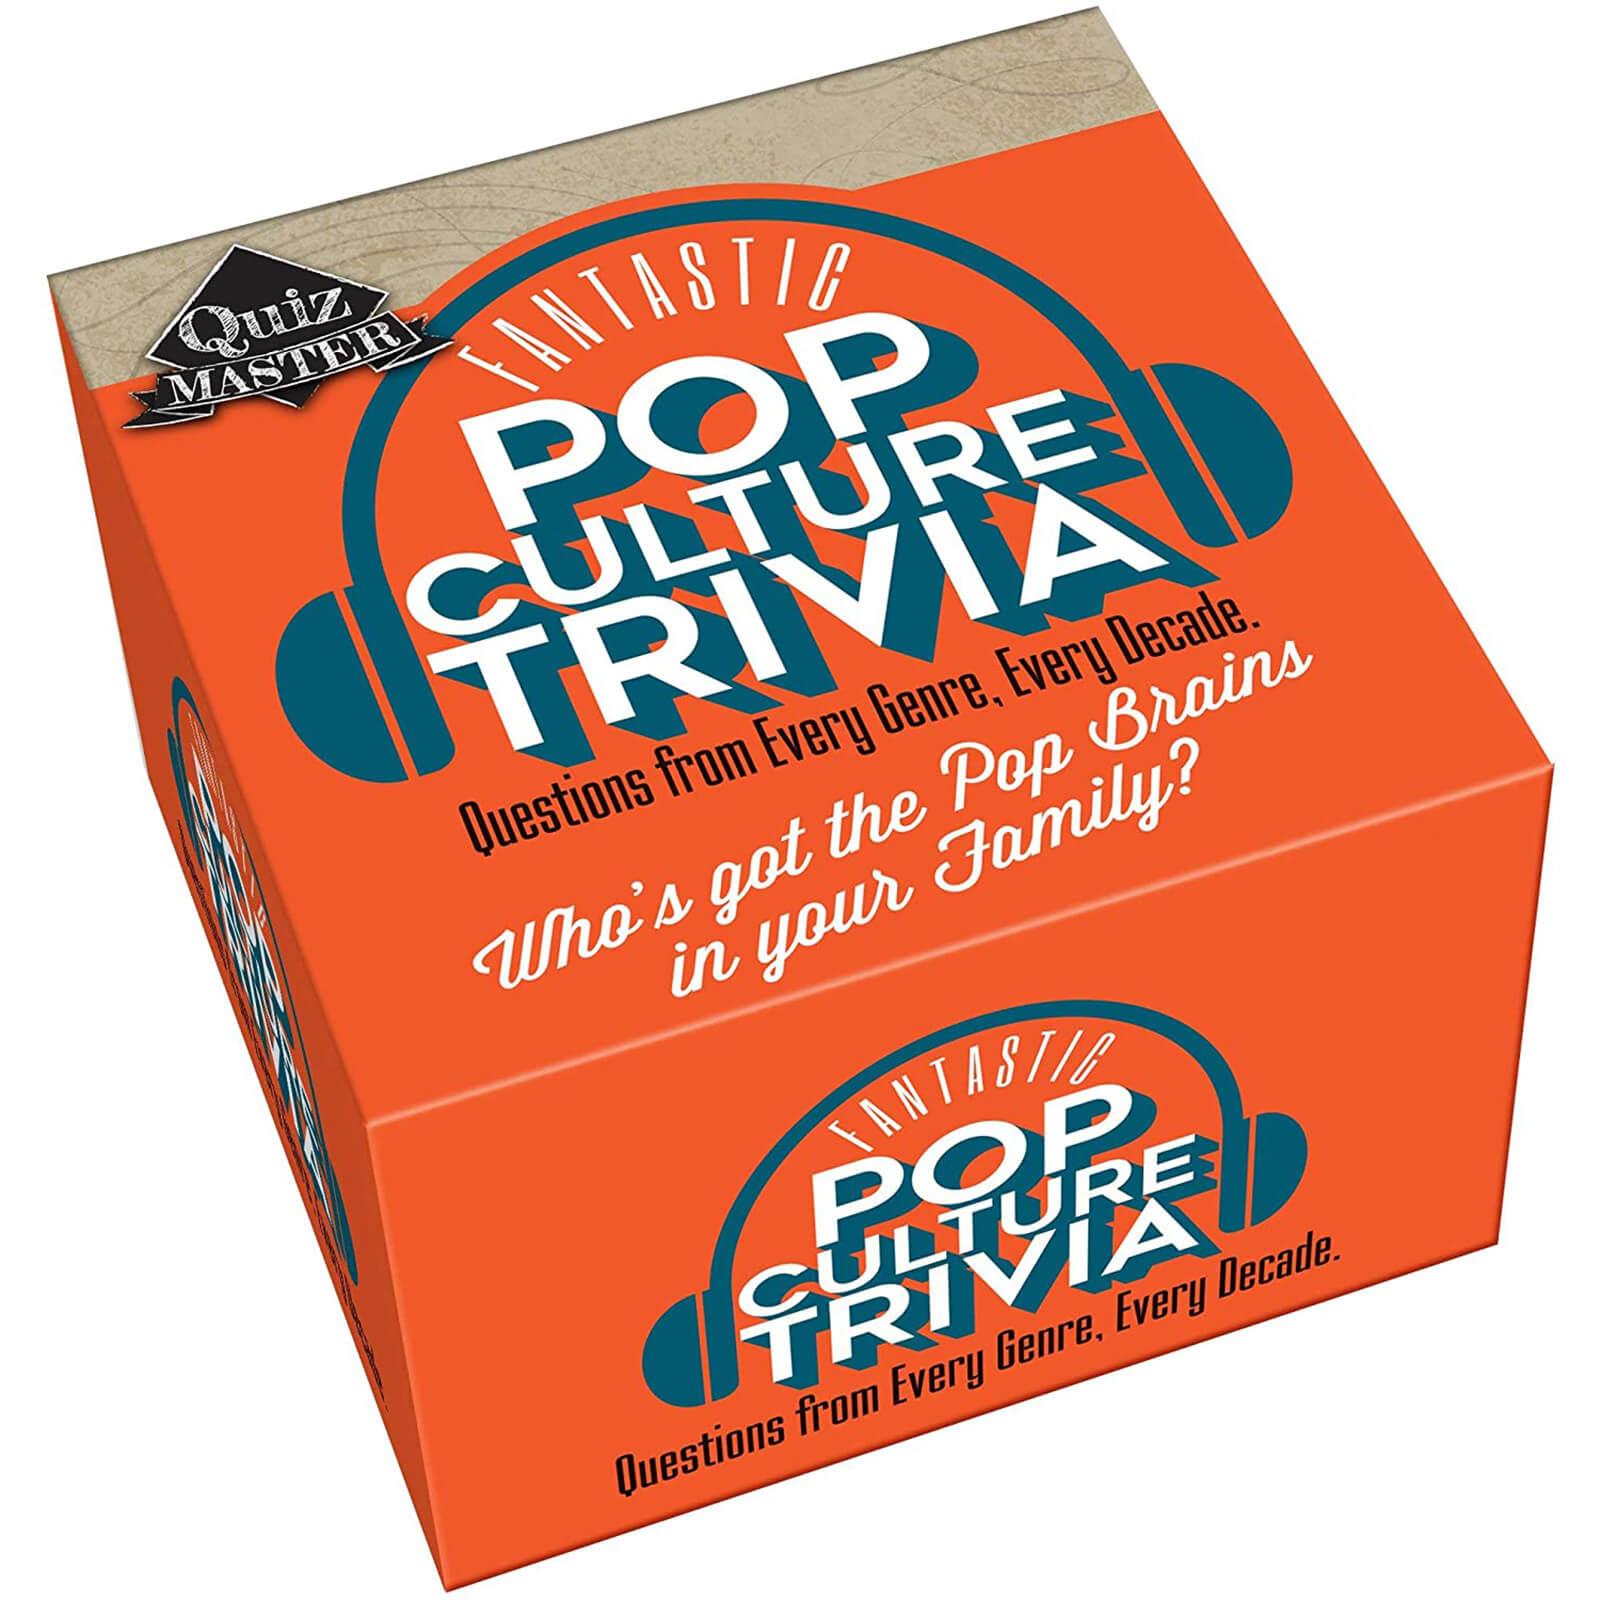 Image of QuizMaster - Pop Culture Trivia Game